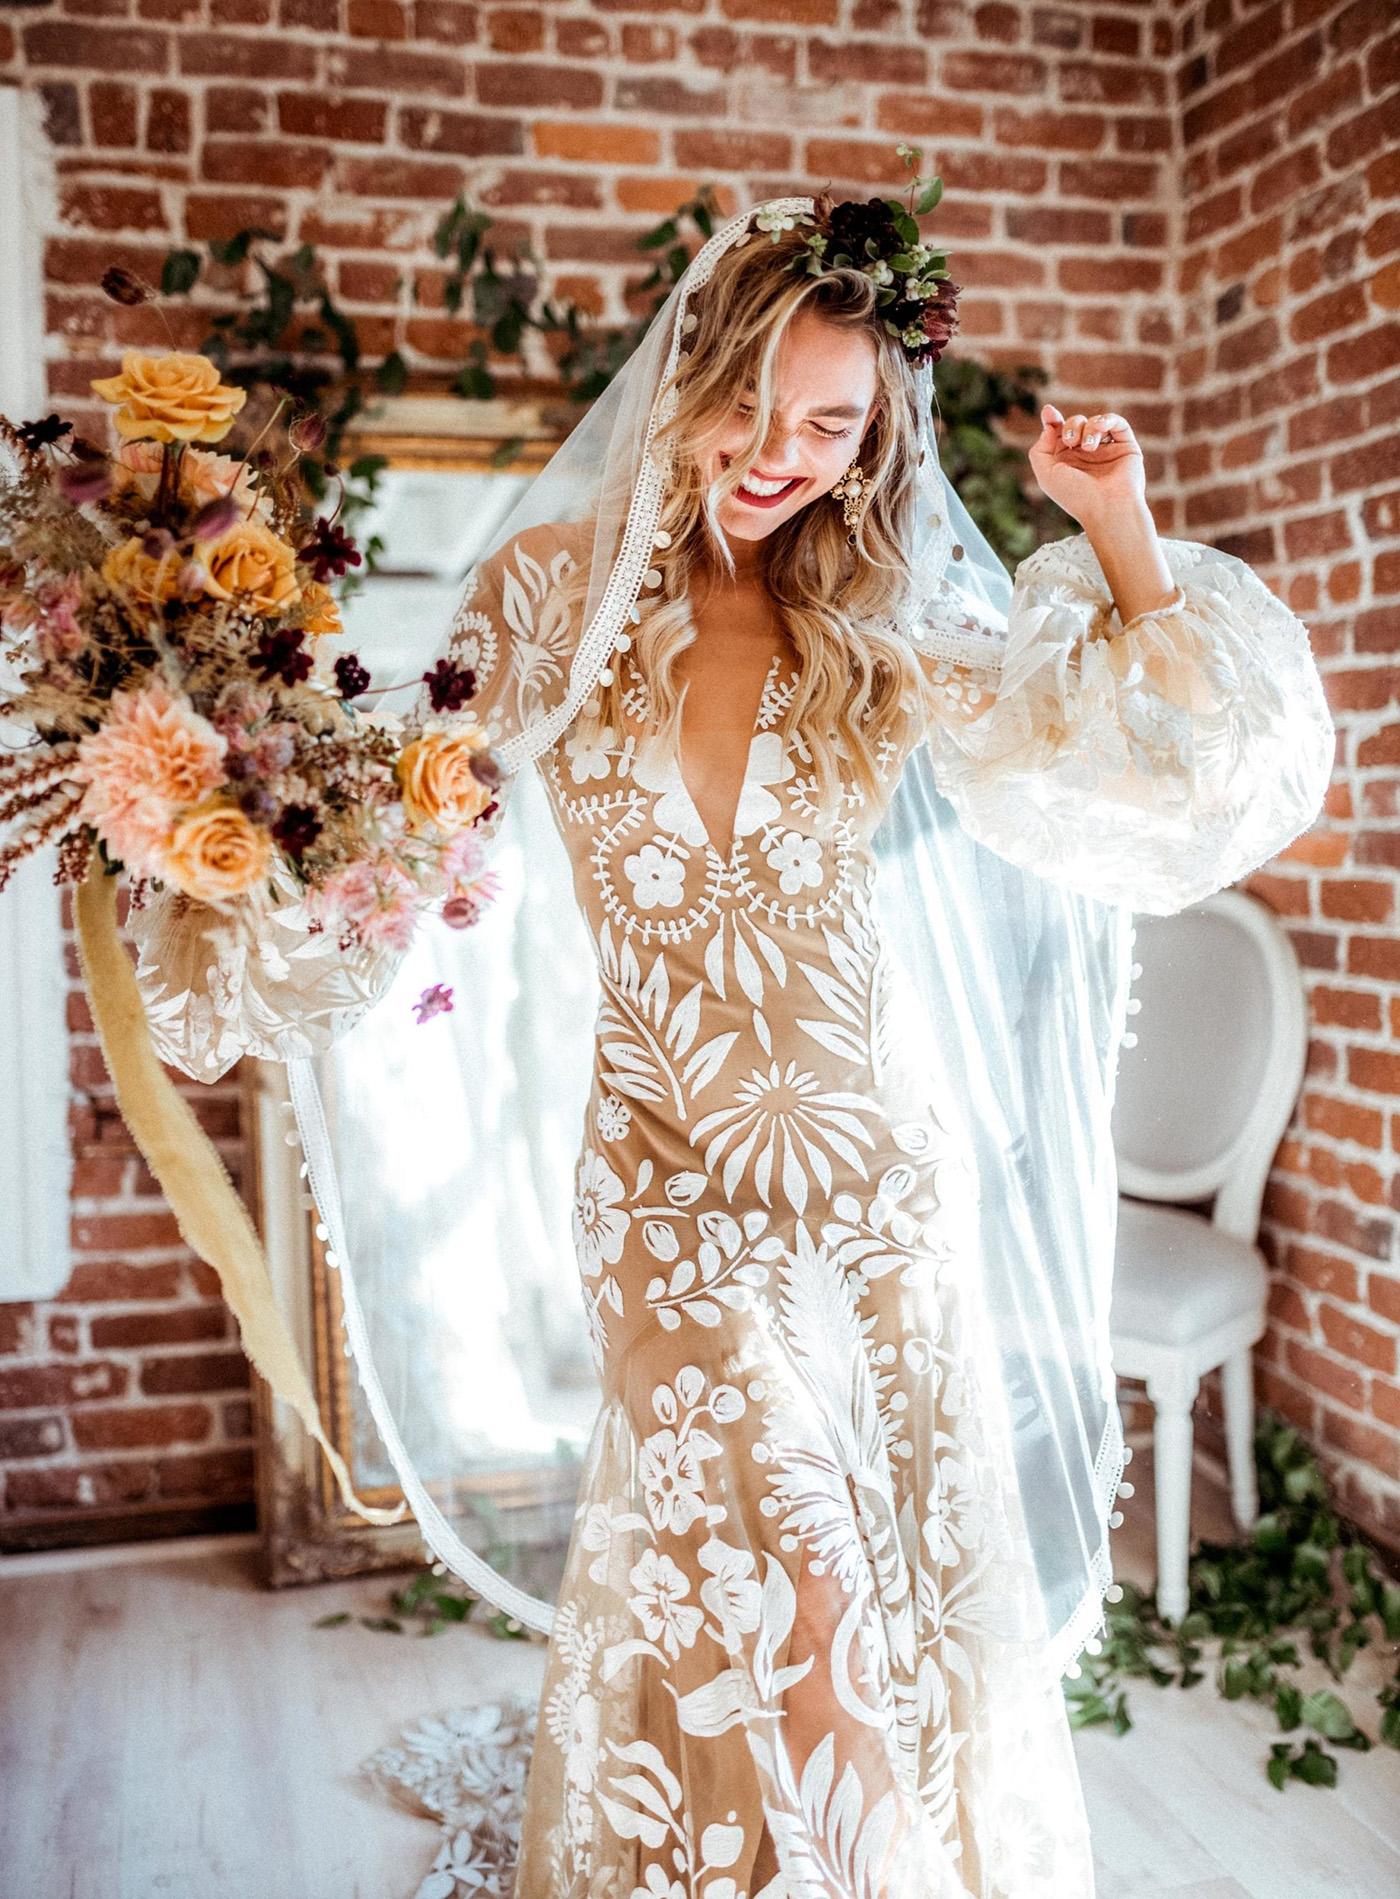 LovelyBride Wedding Shop in Los Angeles